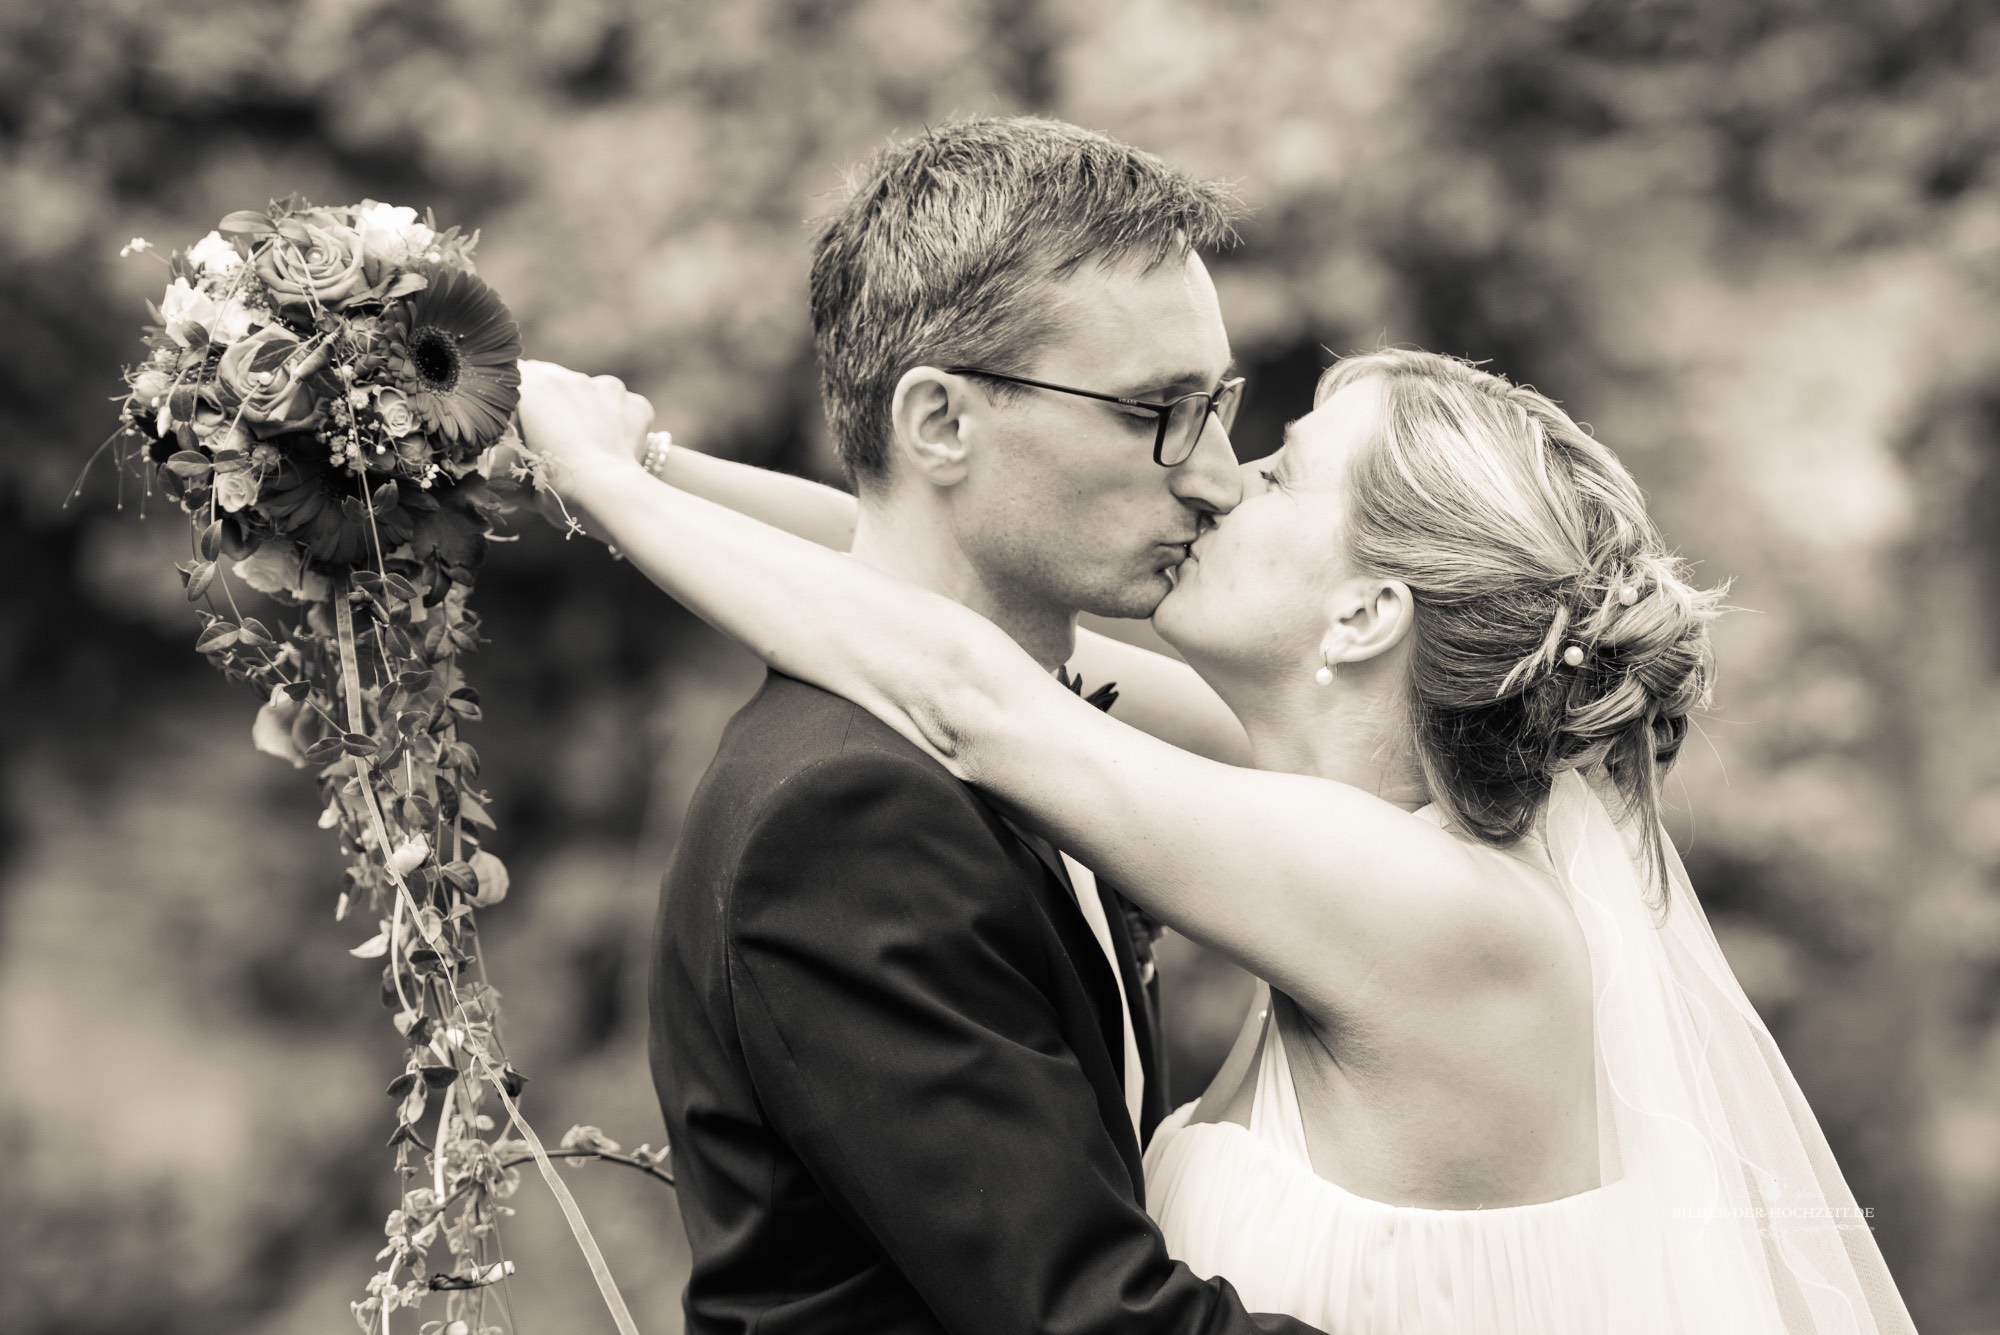 Umarmung_des_Brautpaares.jpg